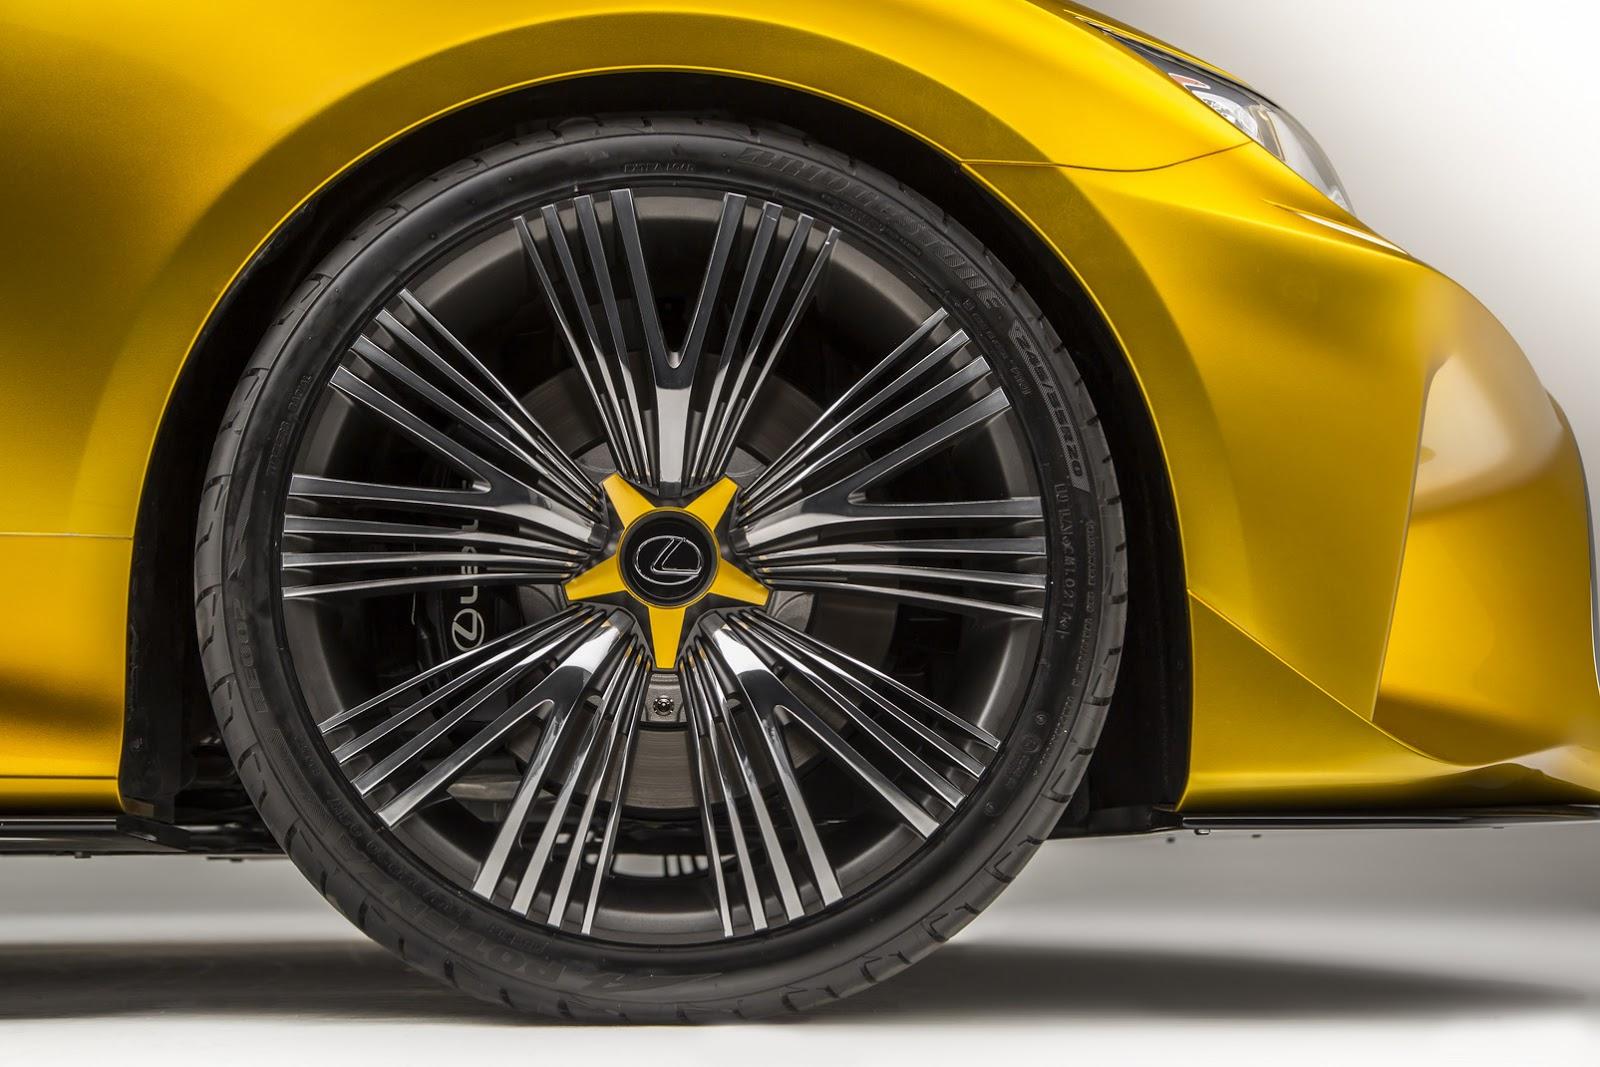 http://www.carstyling.ru/resources/concept/2014-Lexus-LF-C2-Concept-29.jpg